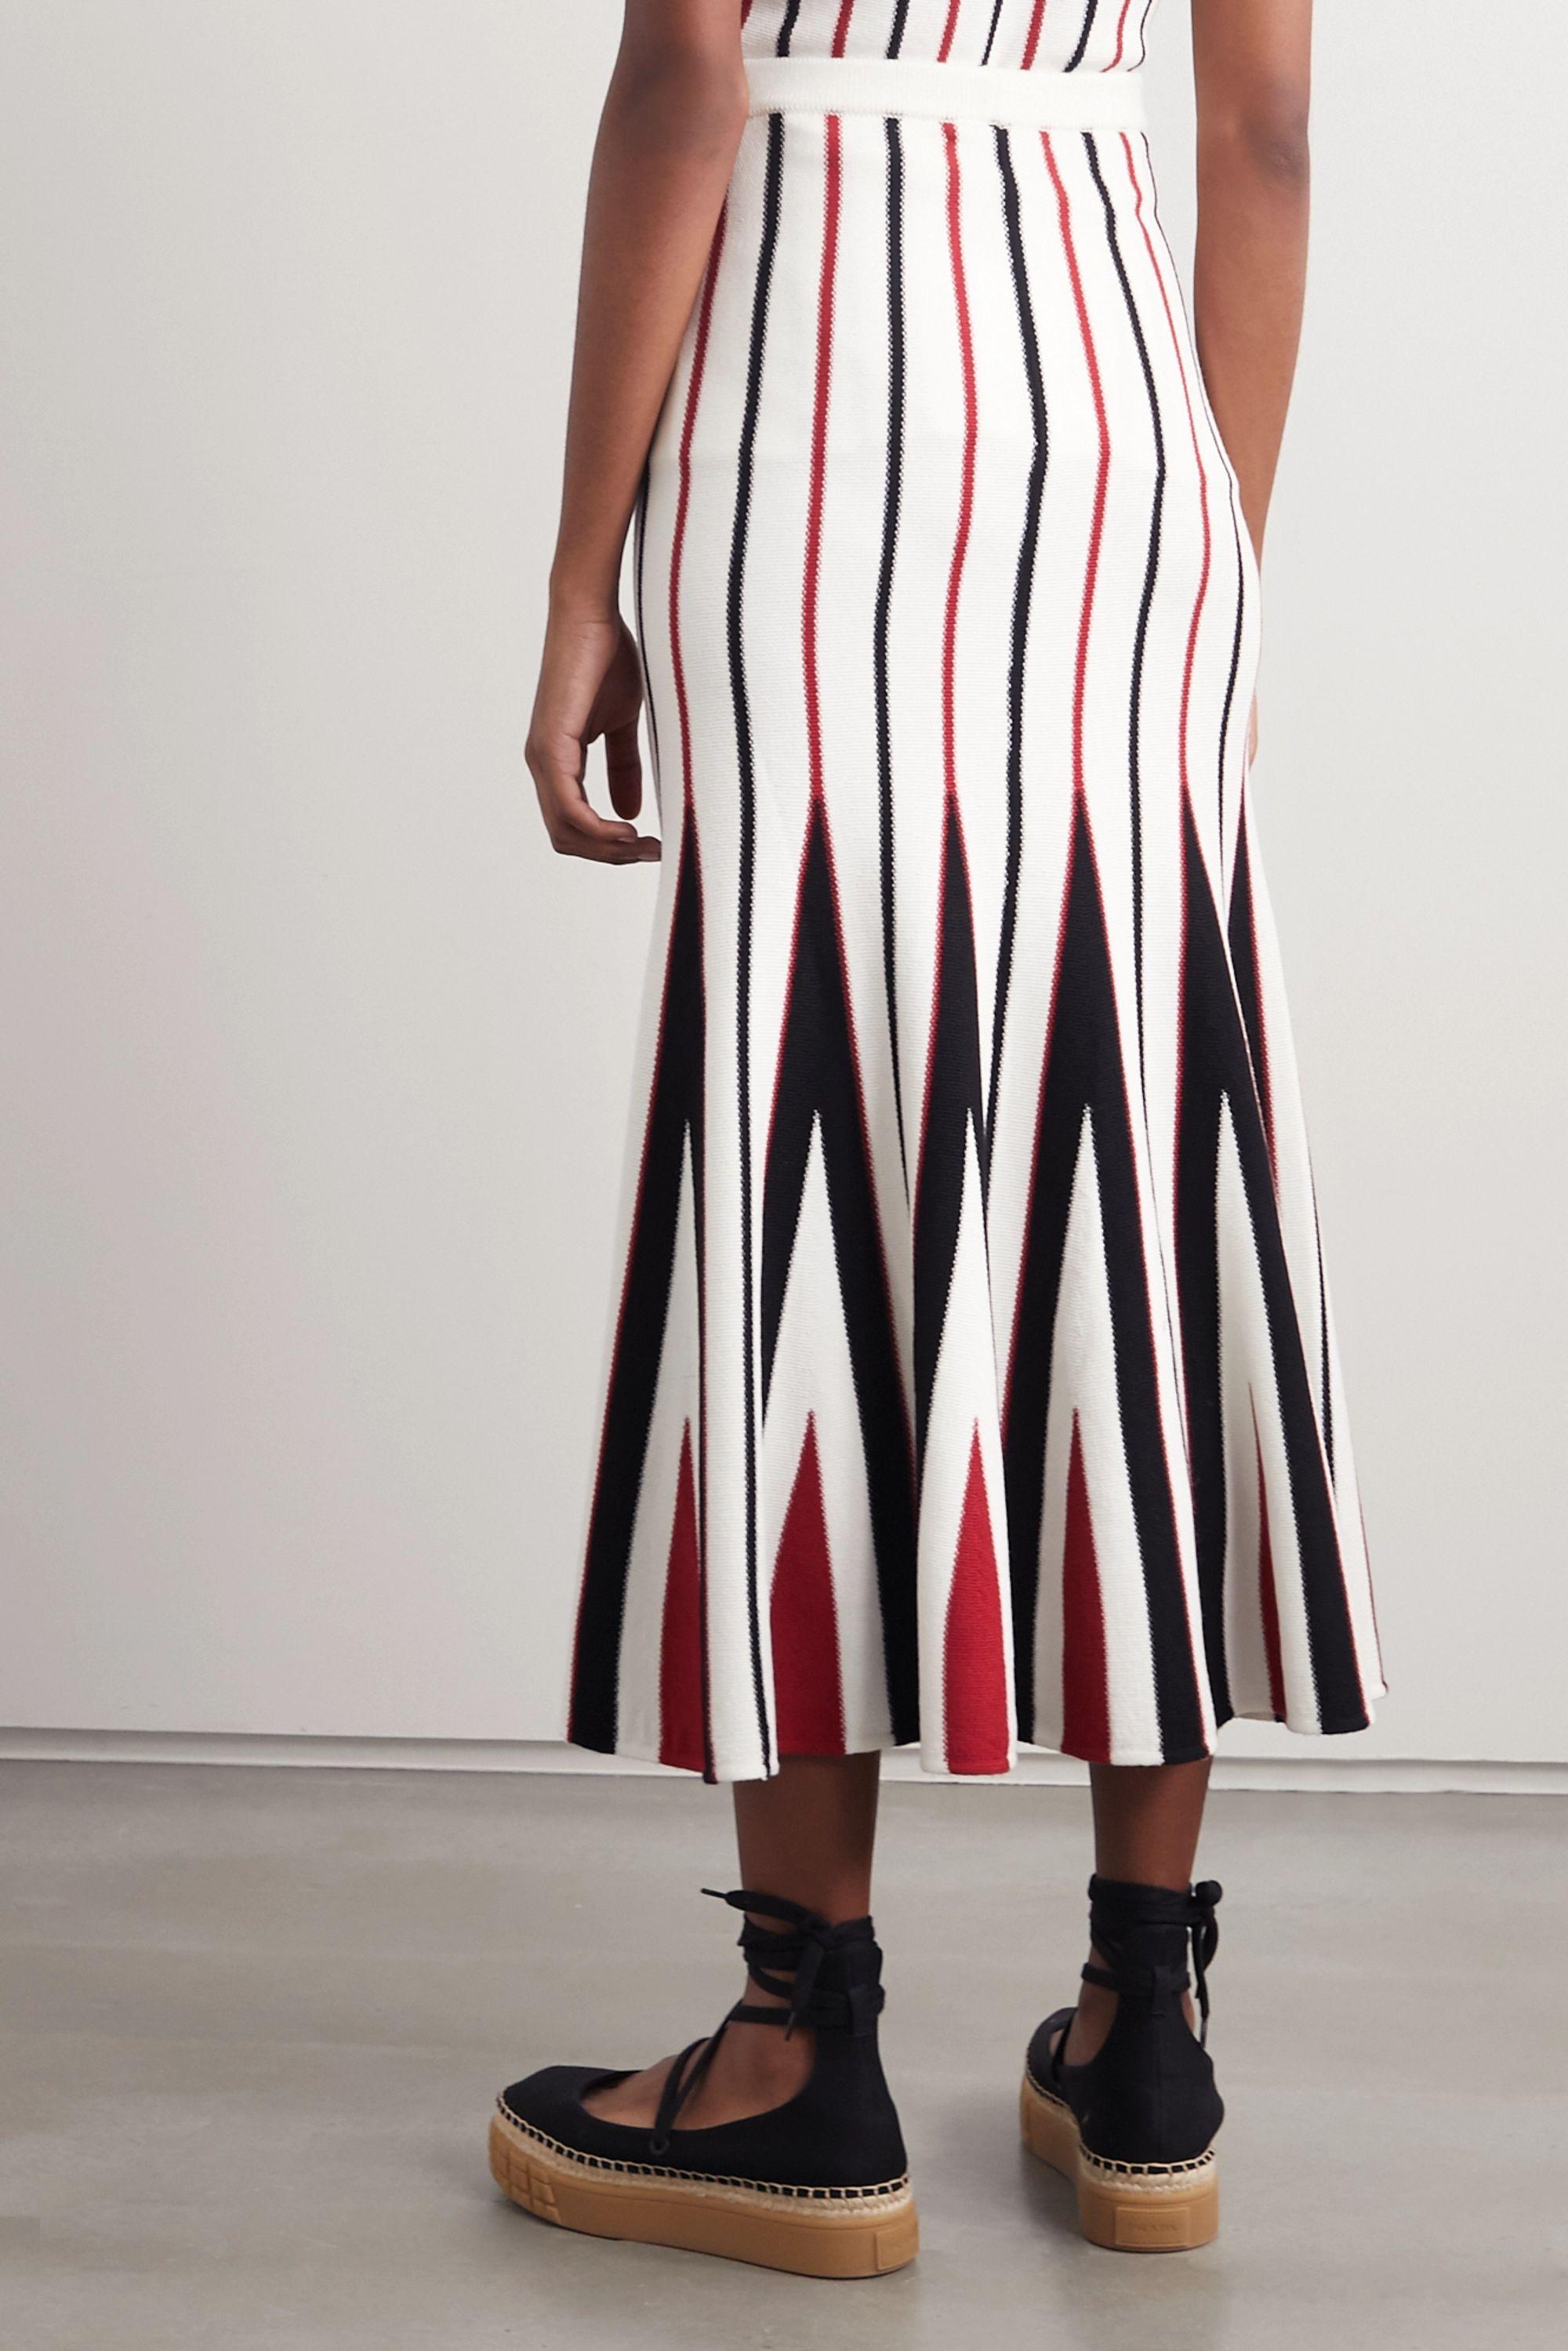 Gabriela Hearst Aegina striped wool midi skirt